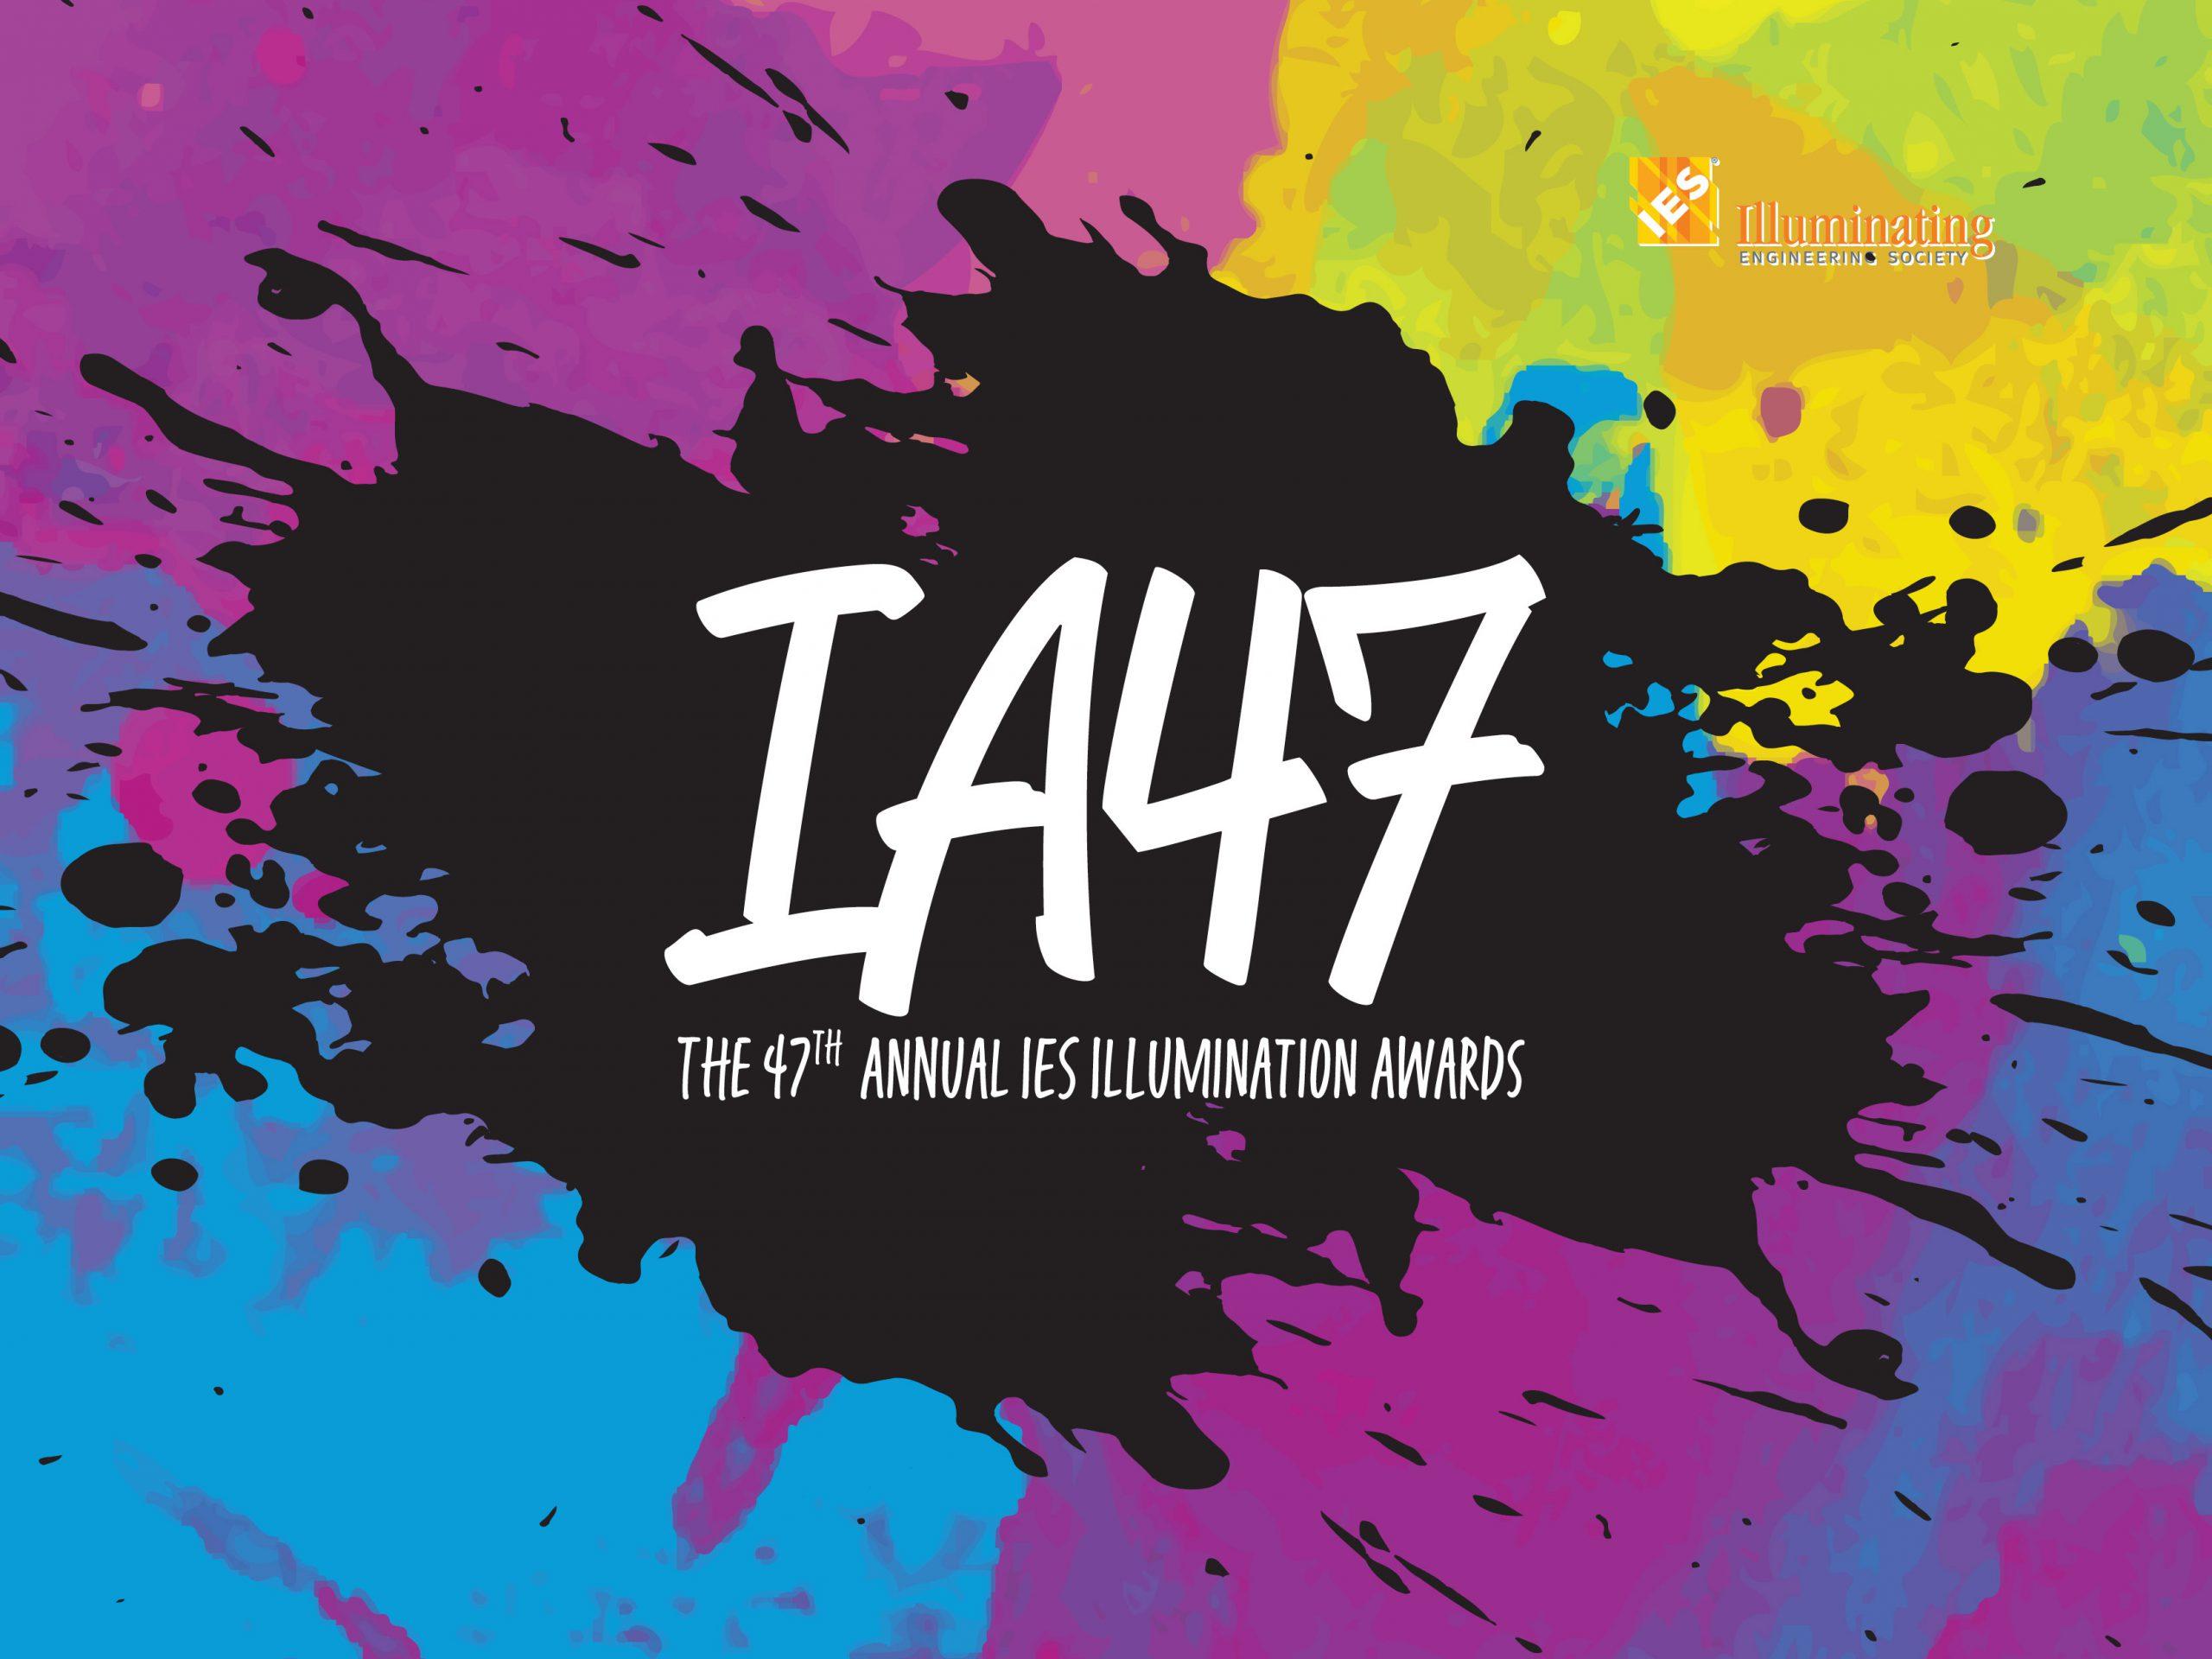 2020 illumination awards ies